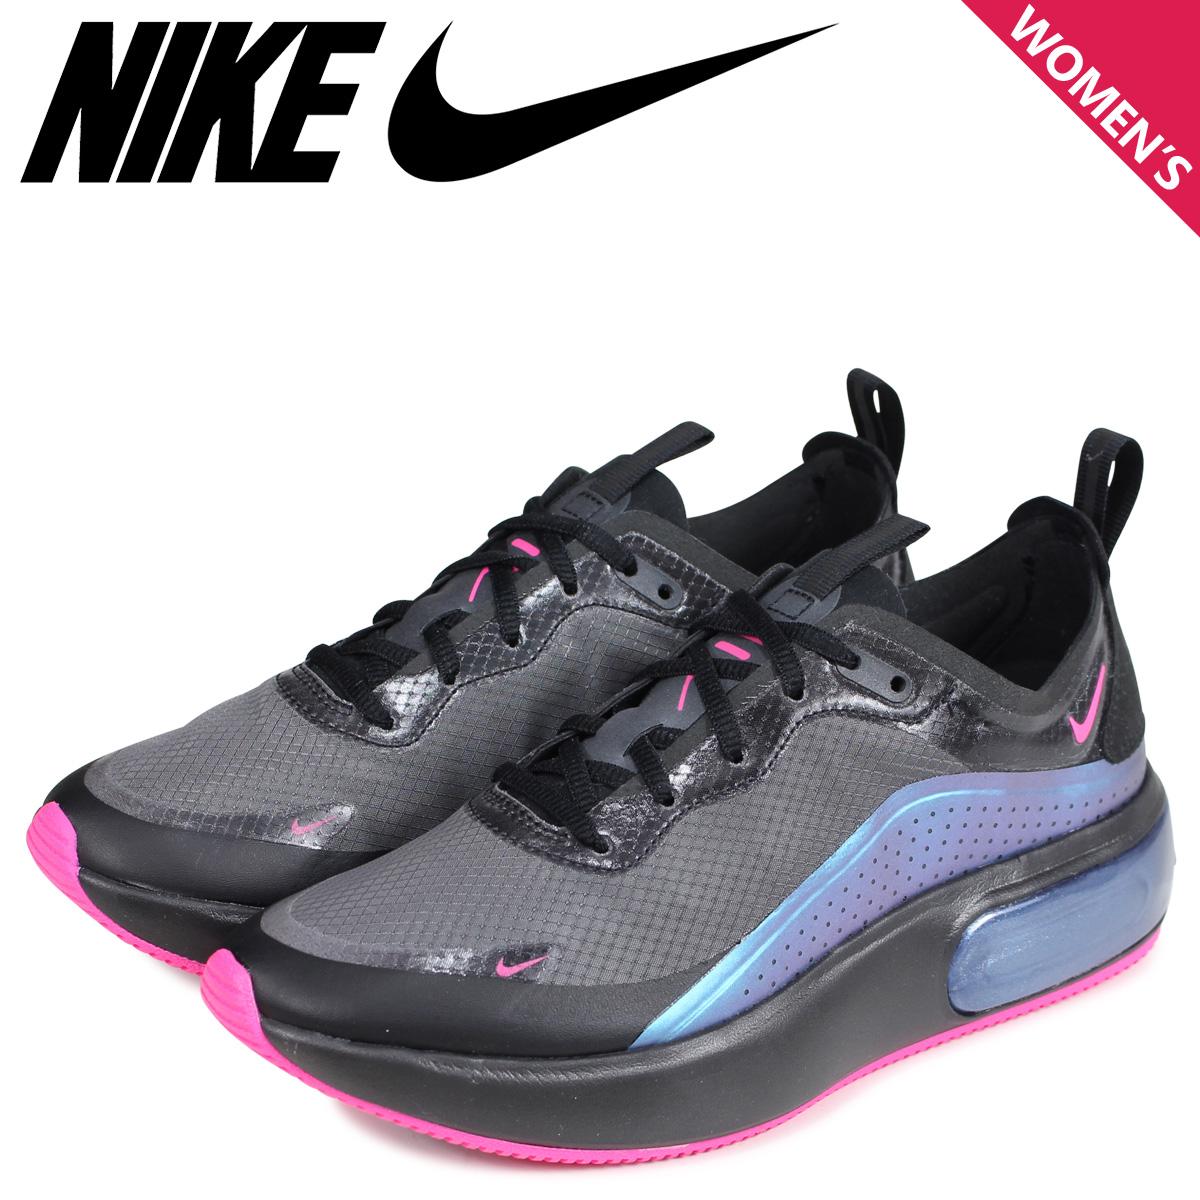 NIKE Kie Ney AMAX Deer sneakers Lady's WMNS AIR MAX DIA SE THROWBACK FUTURE black black AR7410 001